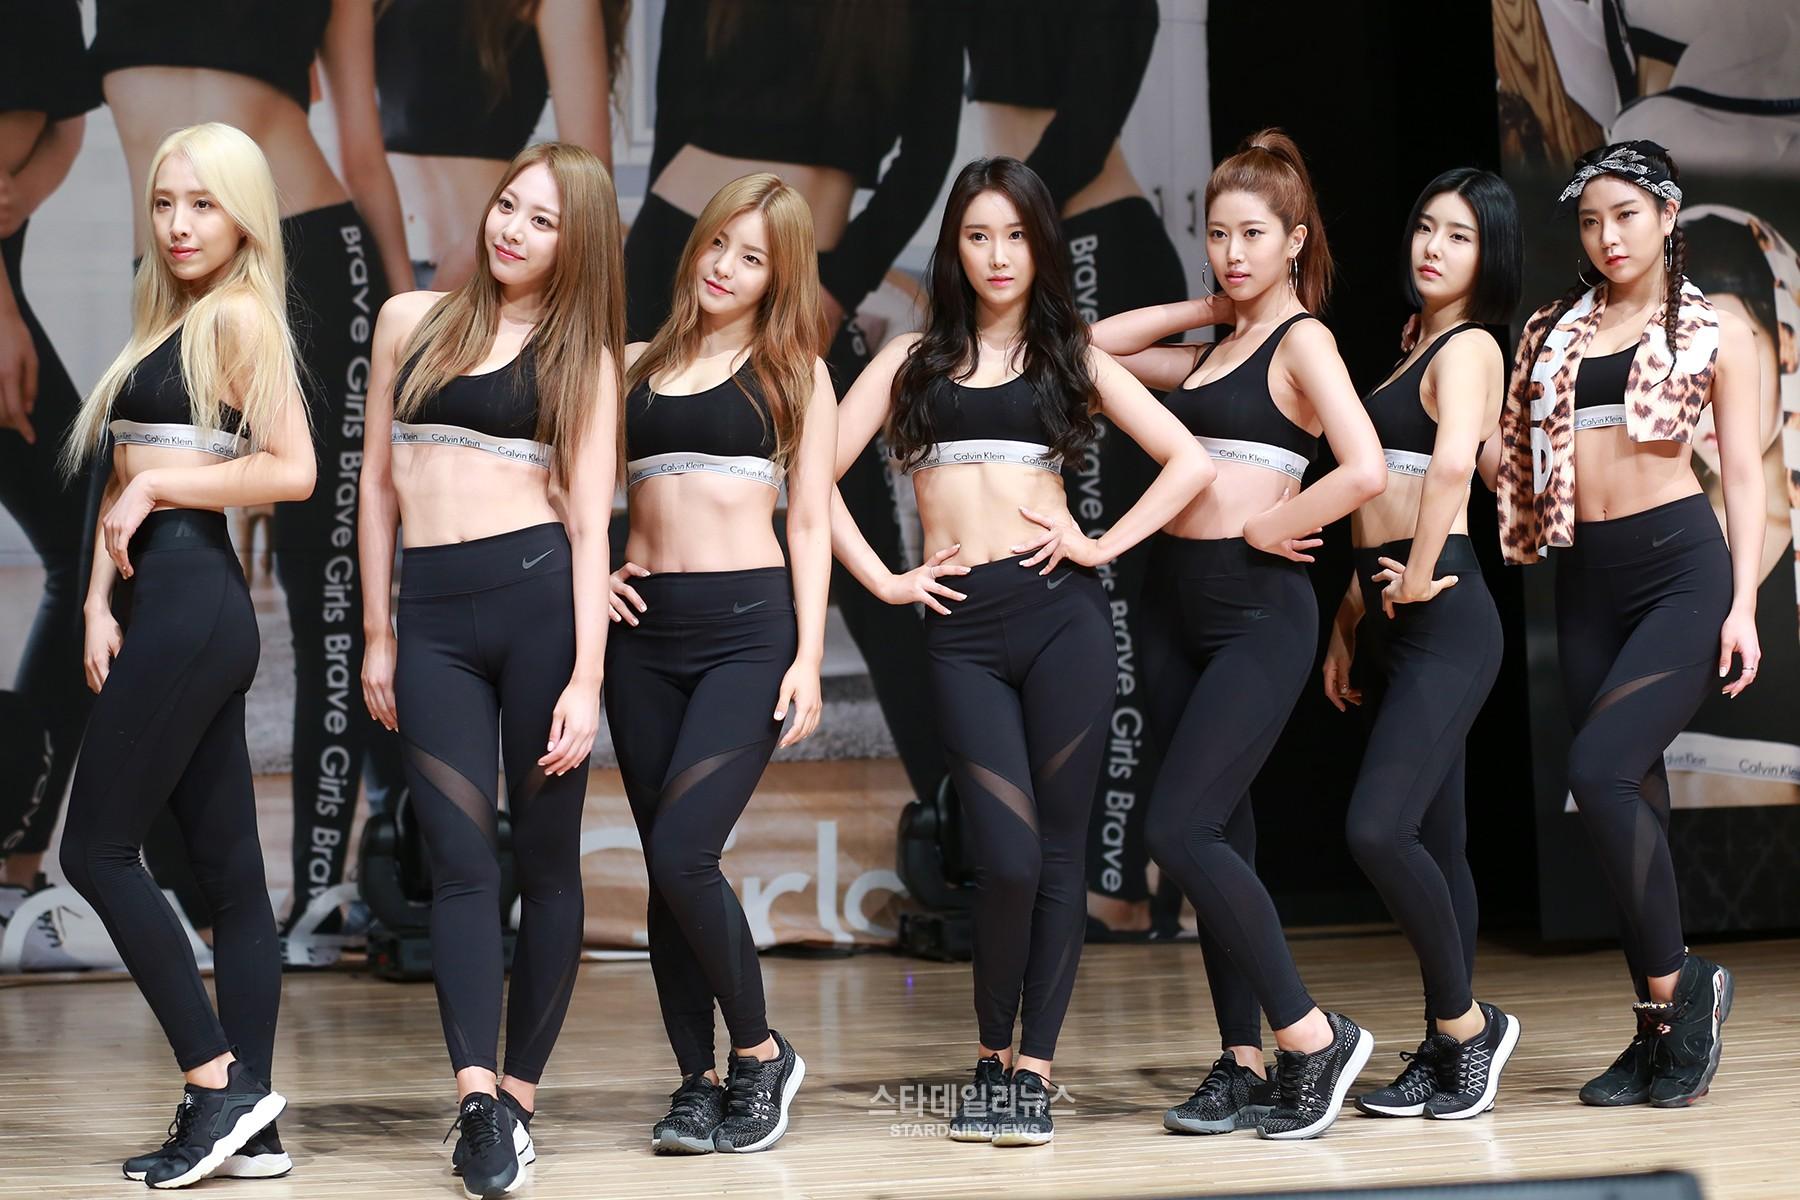 brave girls Brave girls '롤린'(rollin') special choreography video'비글美 폭발'(브레이브걸스, 용감한형제, 골링춤, 여우춤, 혈압춤) - duration: 7:28.